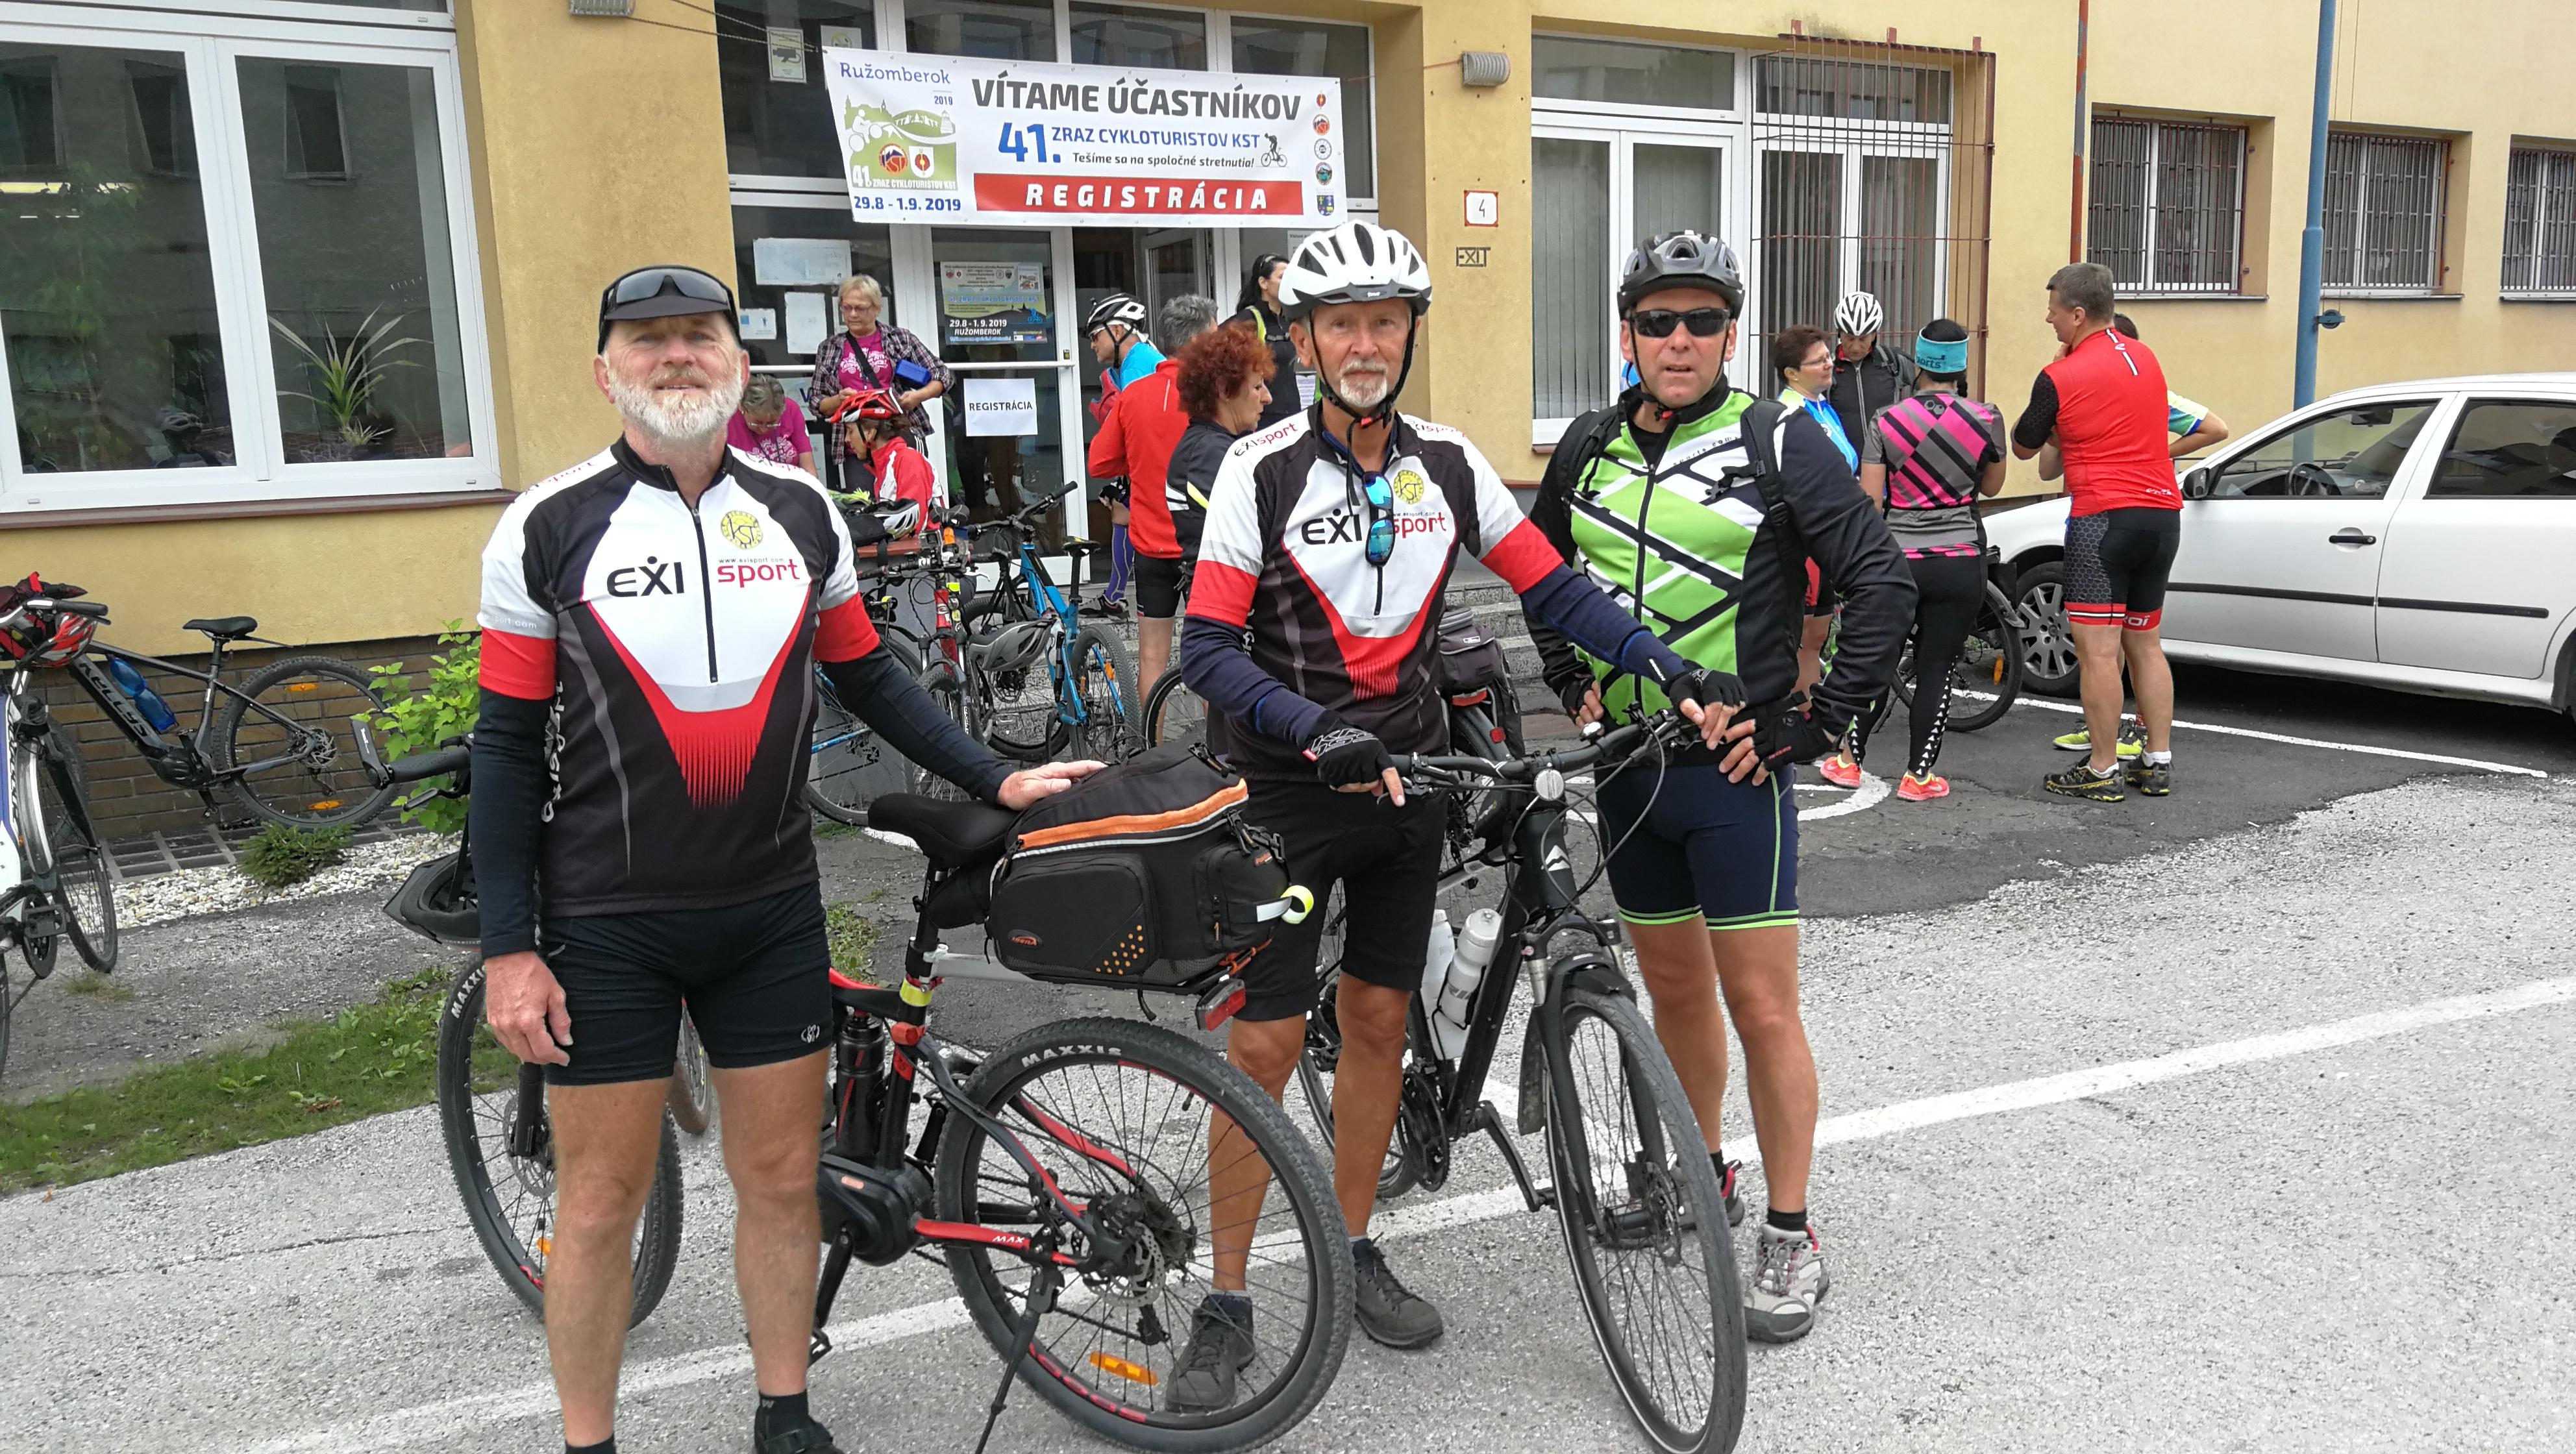 Celoslovenský zraz cykloturistov- 29.8.- 1.9.2019 Ružomberok (foto Gazda)